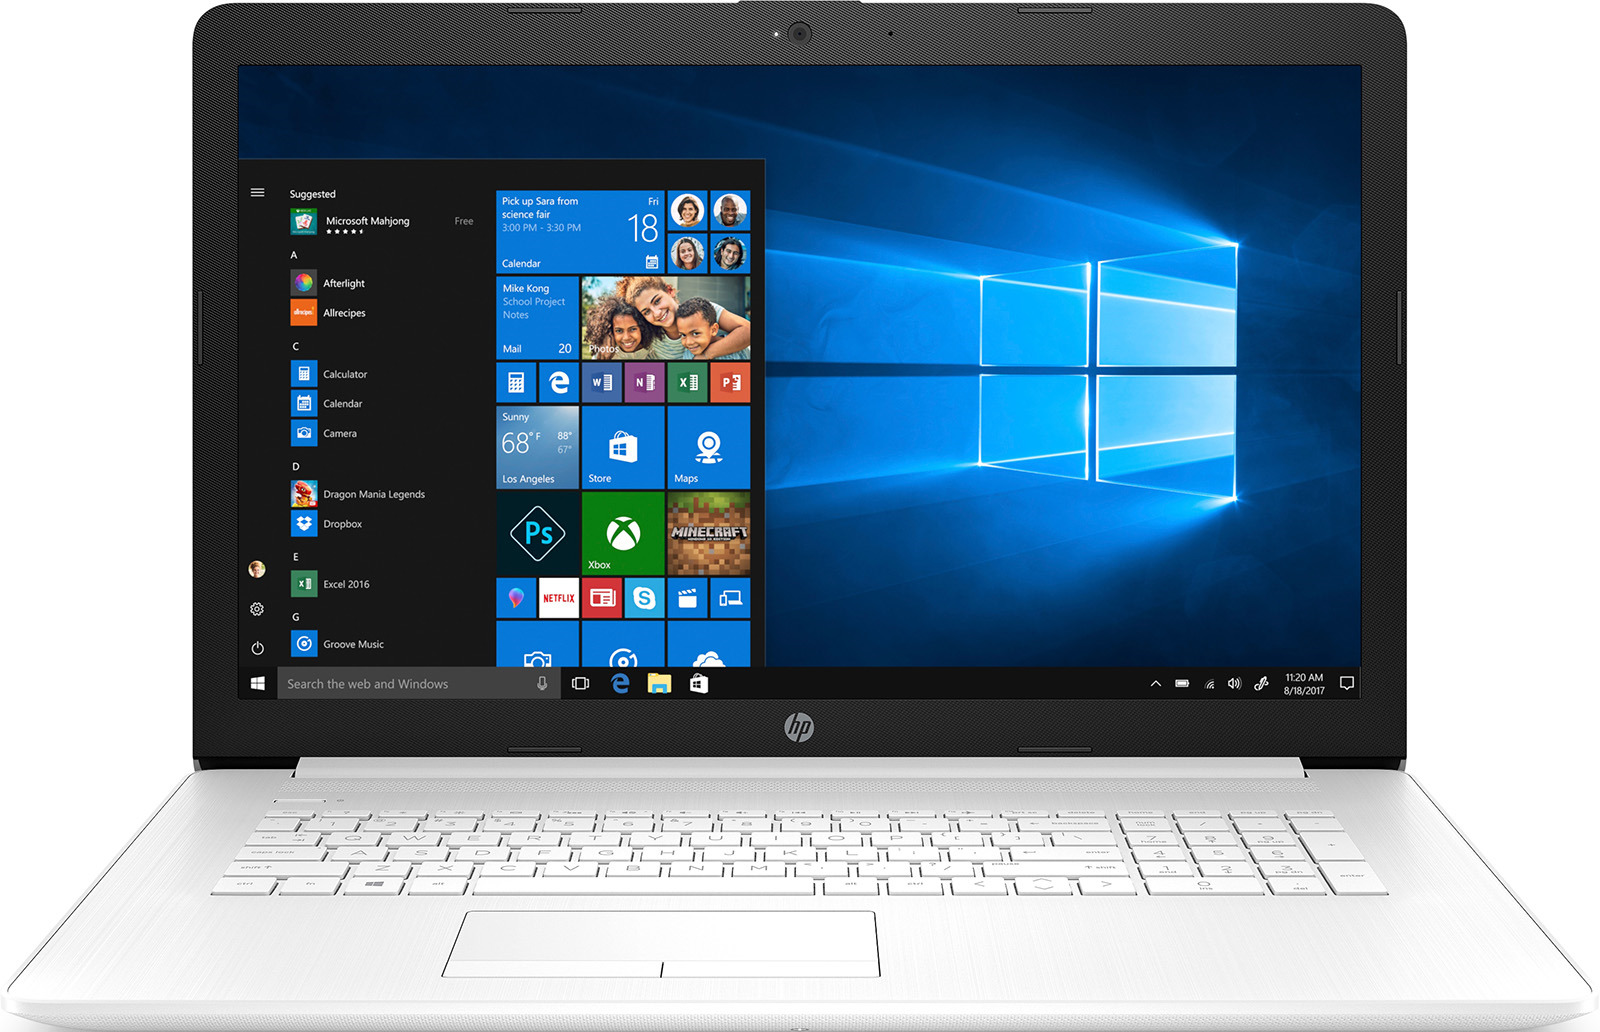 Ноутбук HP 17-by0049ur 4MK46EA, белый ноутбук hp 17 y021ur x7j08ea